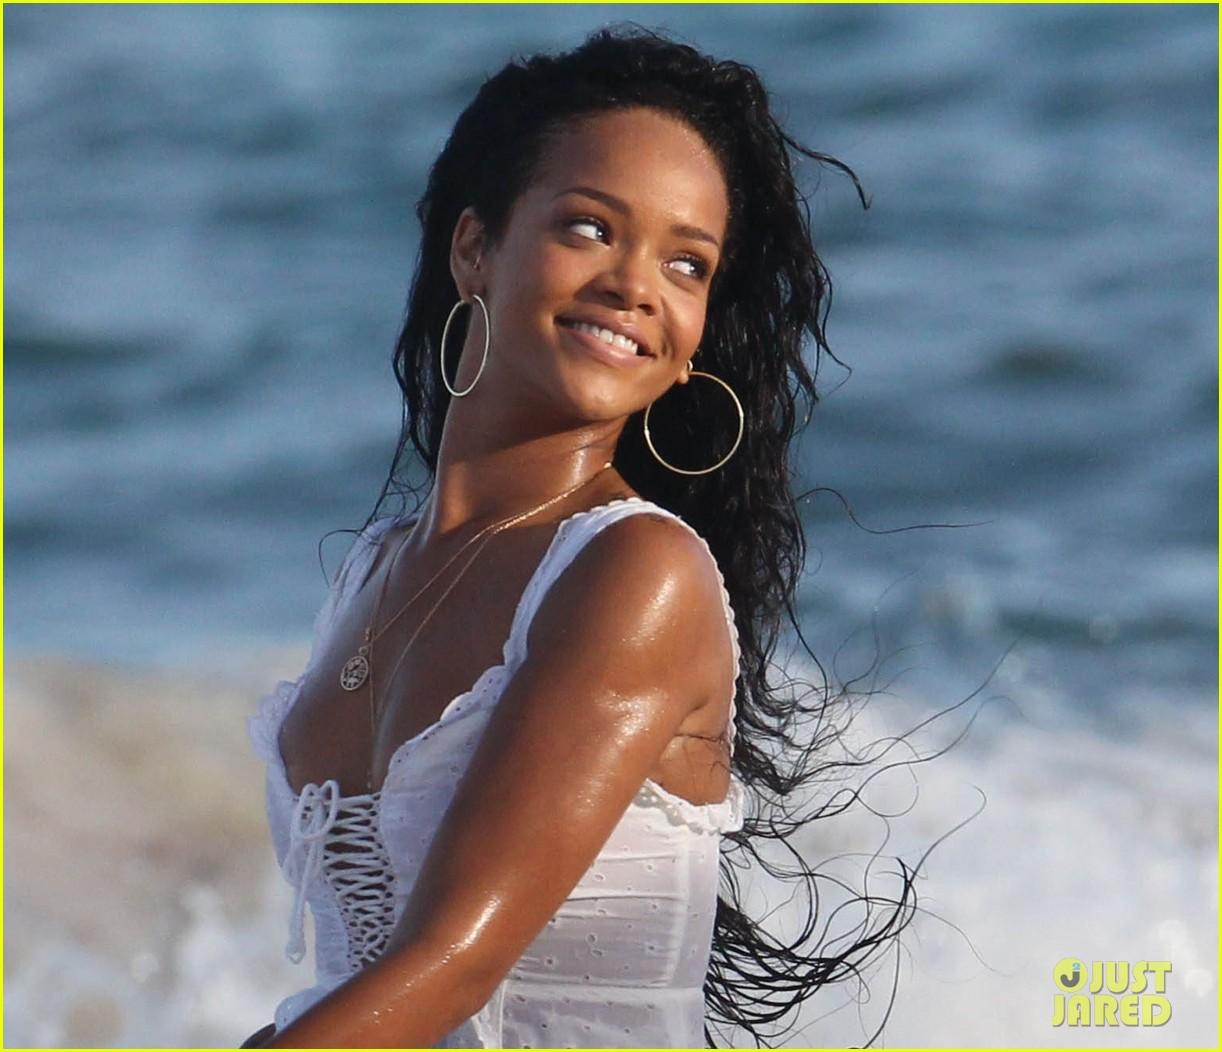 Who Rihanna Dating 2012 Calendar